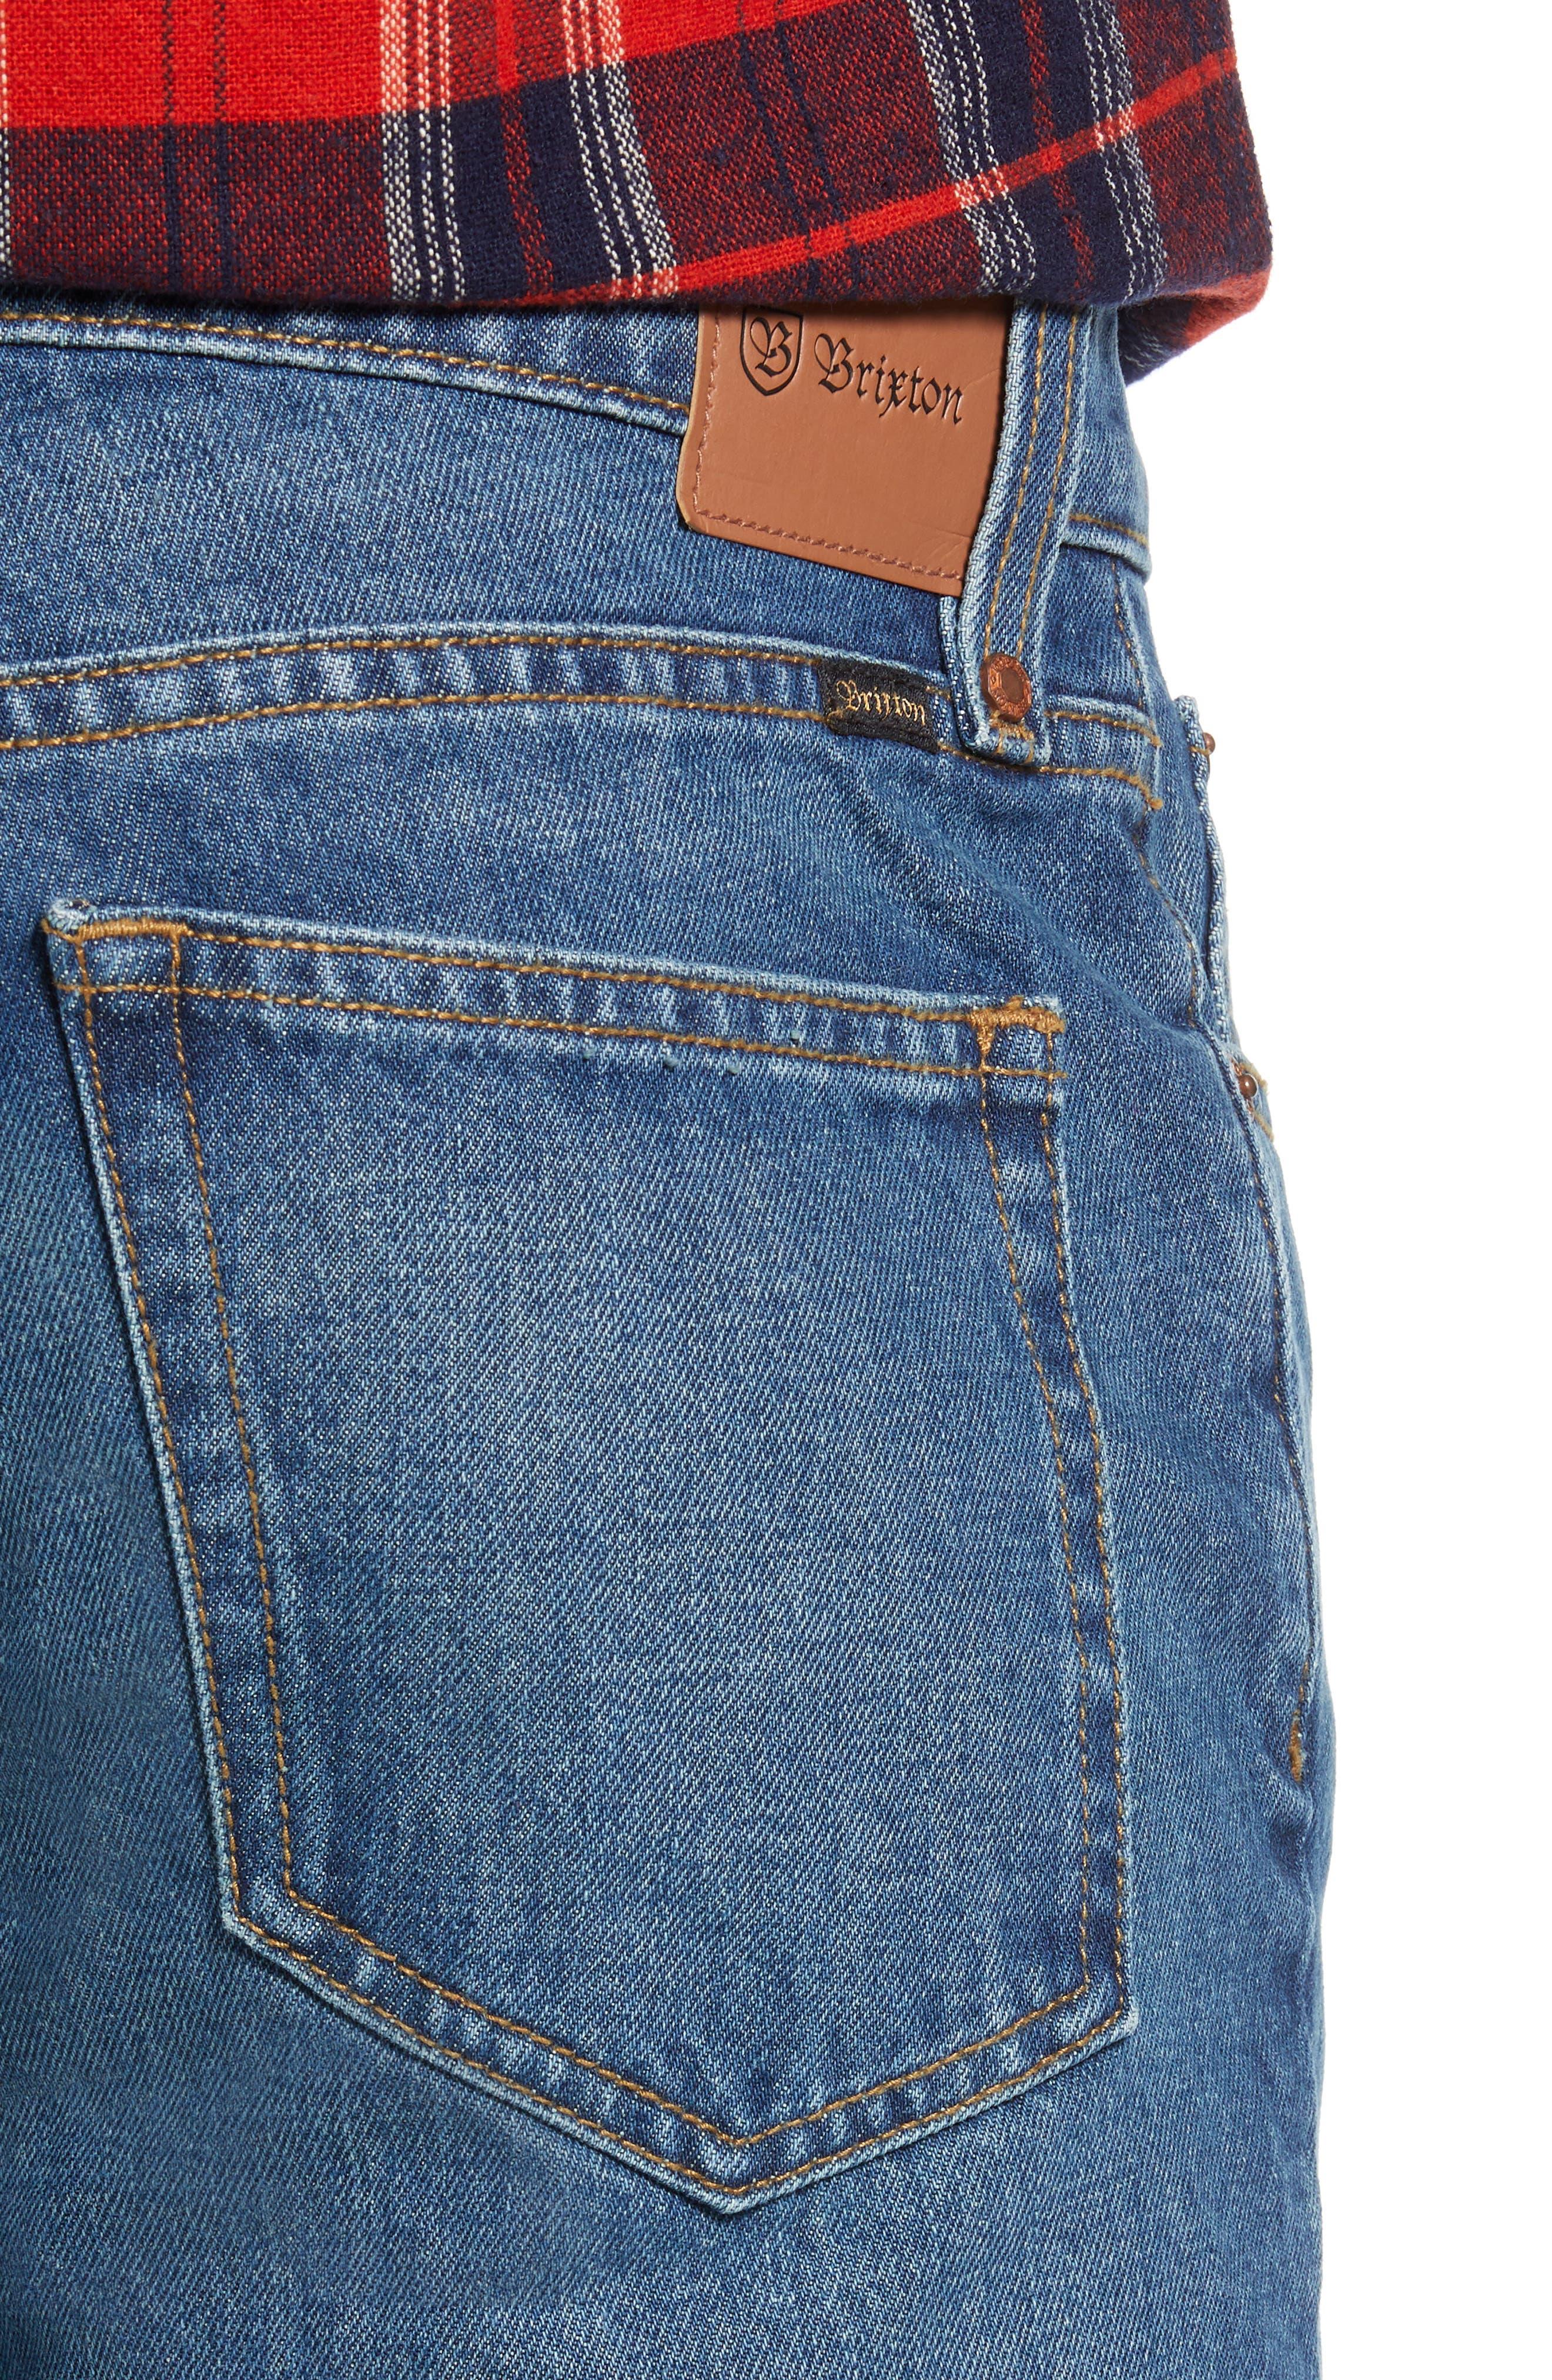 Labor Straight Leg Jeans,                             Alternate thumbnail 4, color,                             400